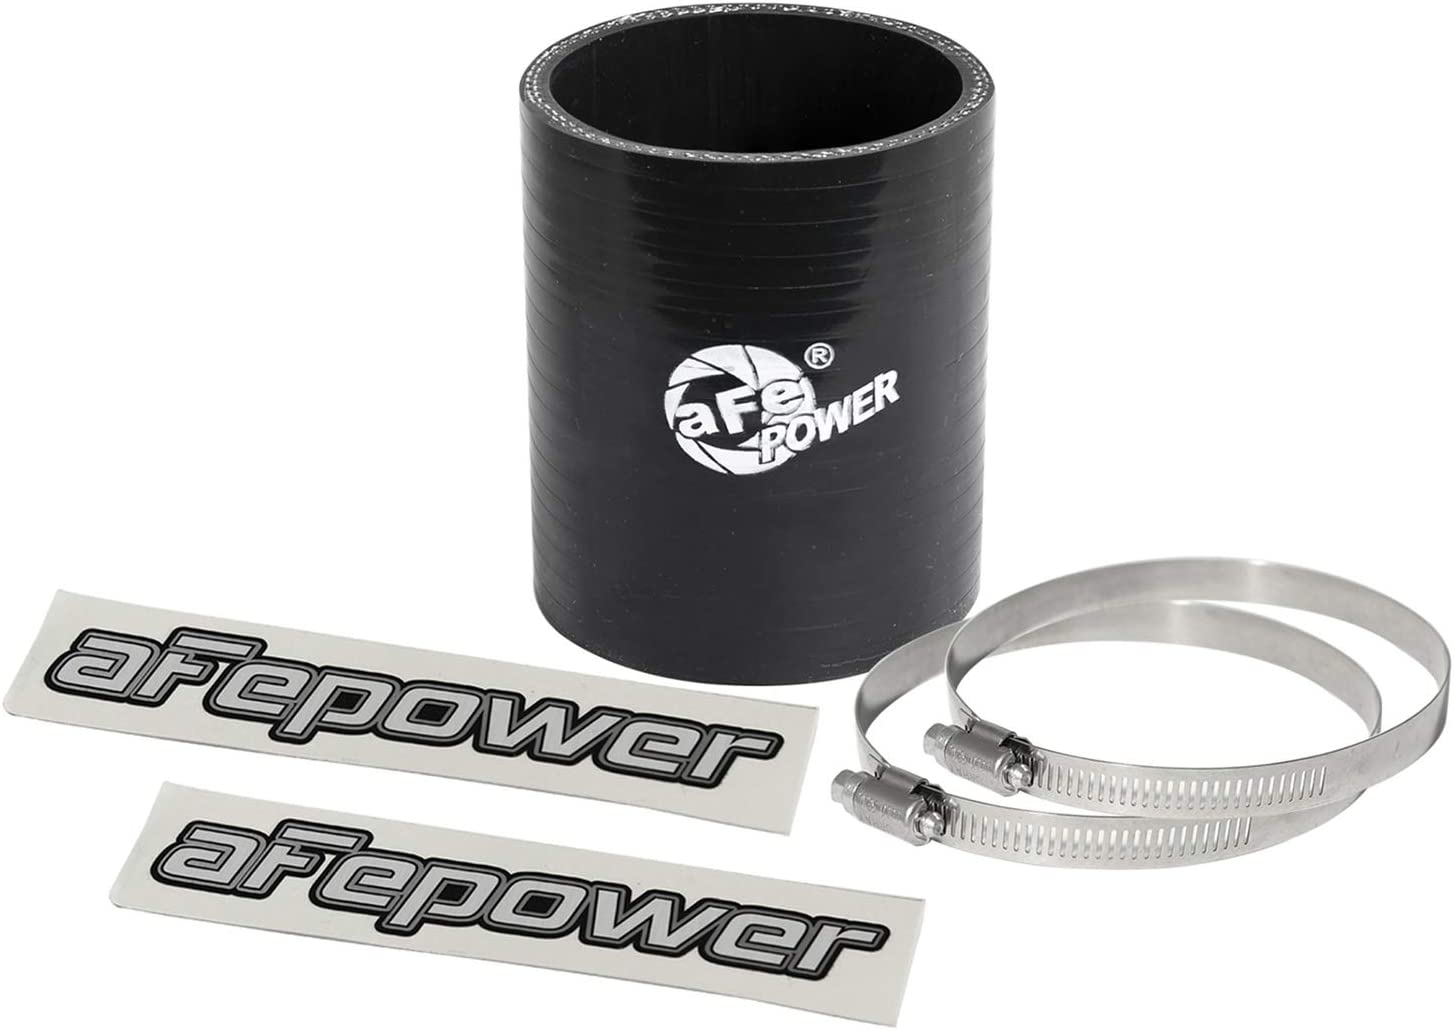 D/&D PowerDrive 1546117C2 CASE IH Replacement Belt 2 Band 64 Length Rubber